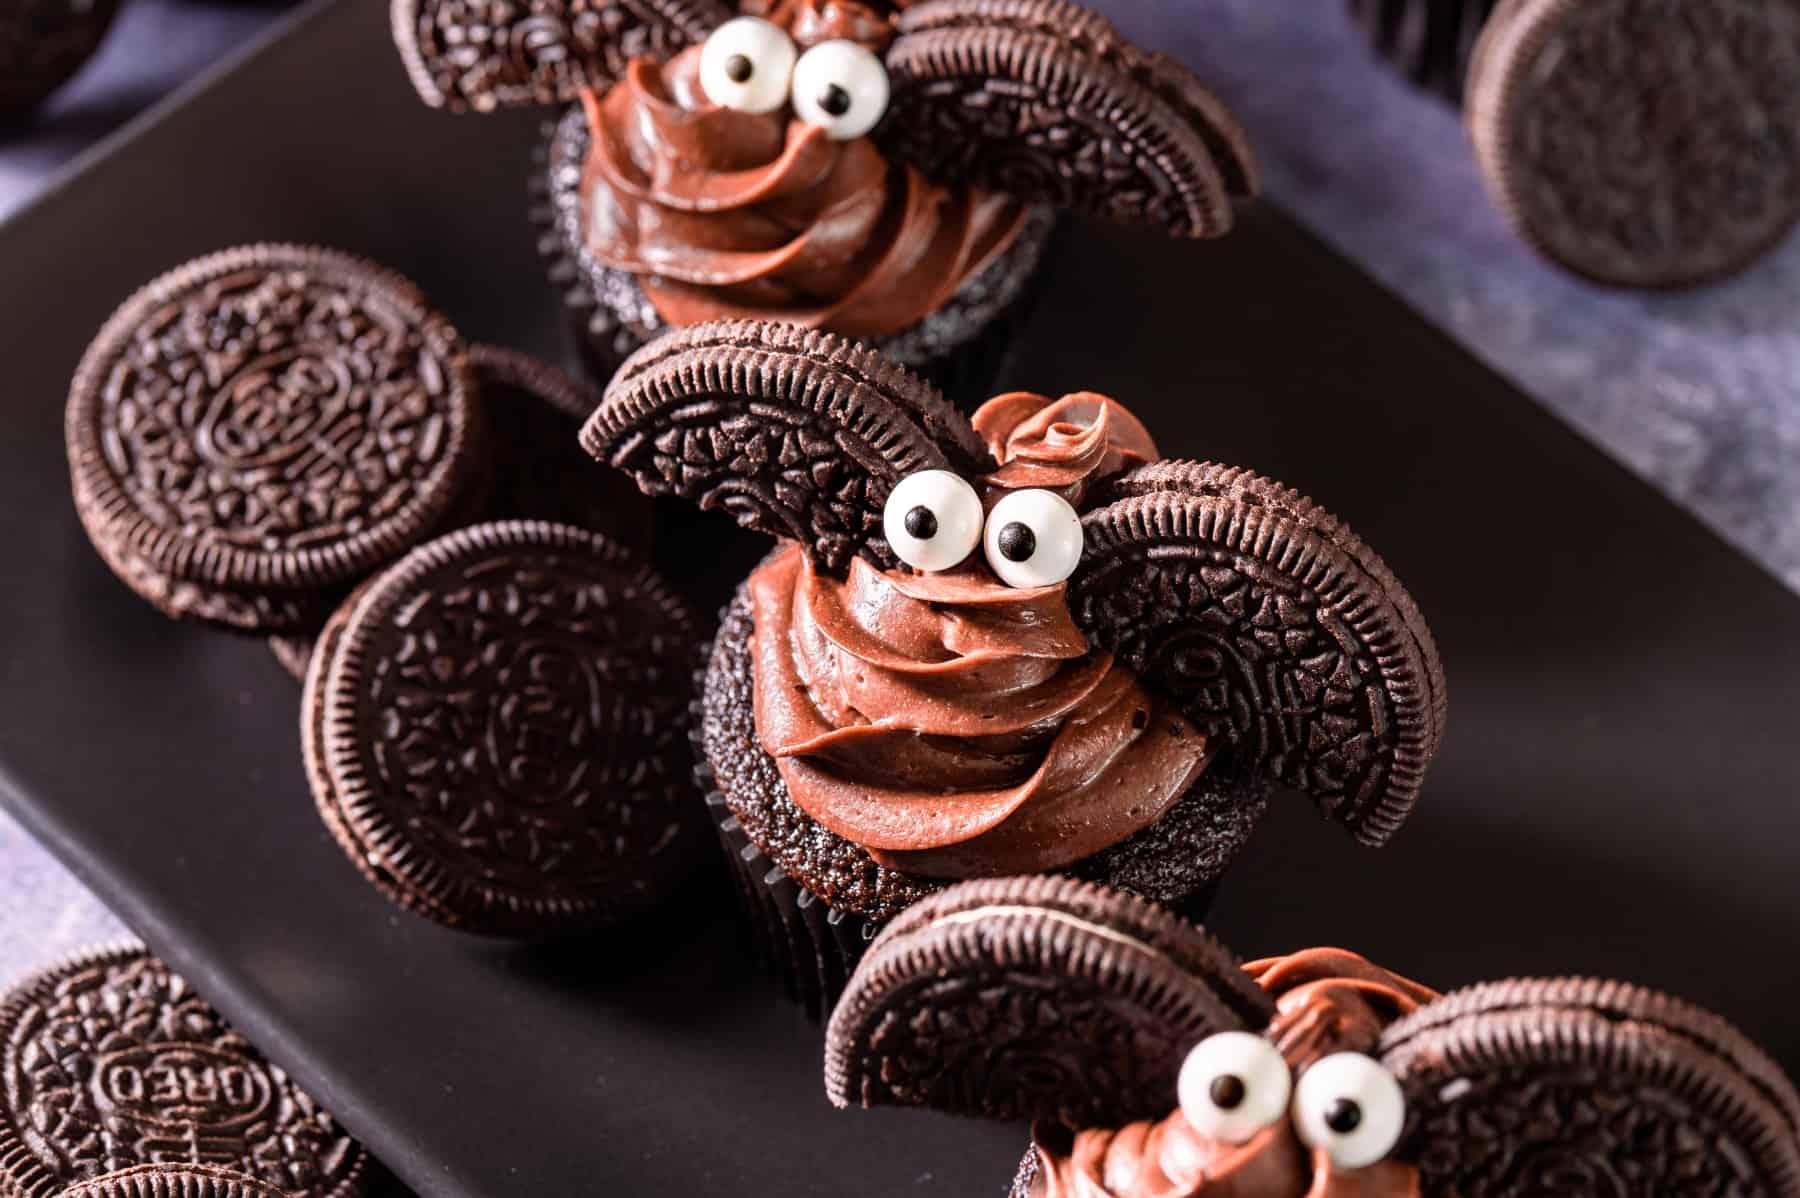 Overhead horizontal shot of bat cupcakes on a long black plate.